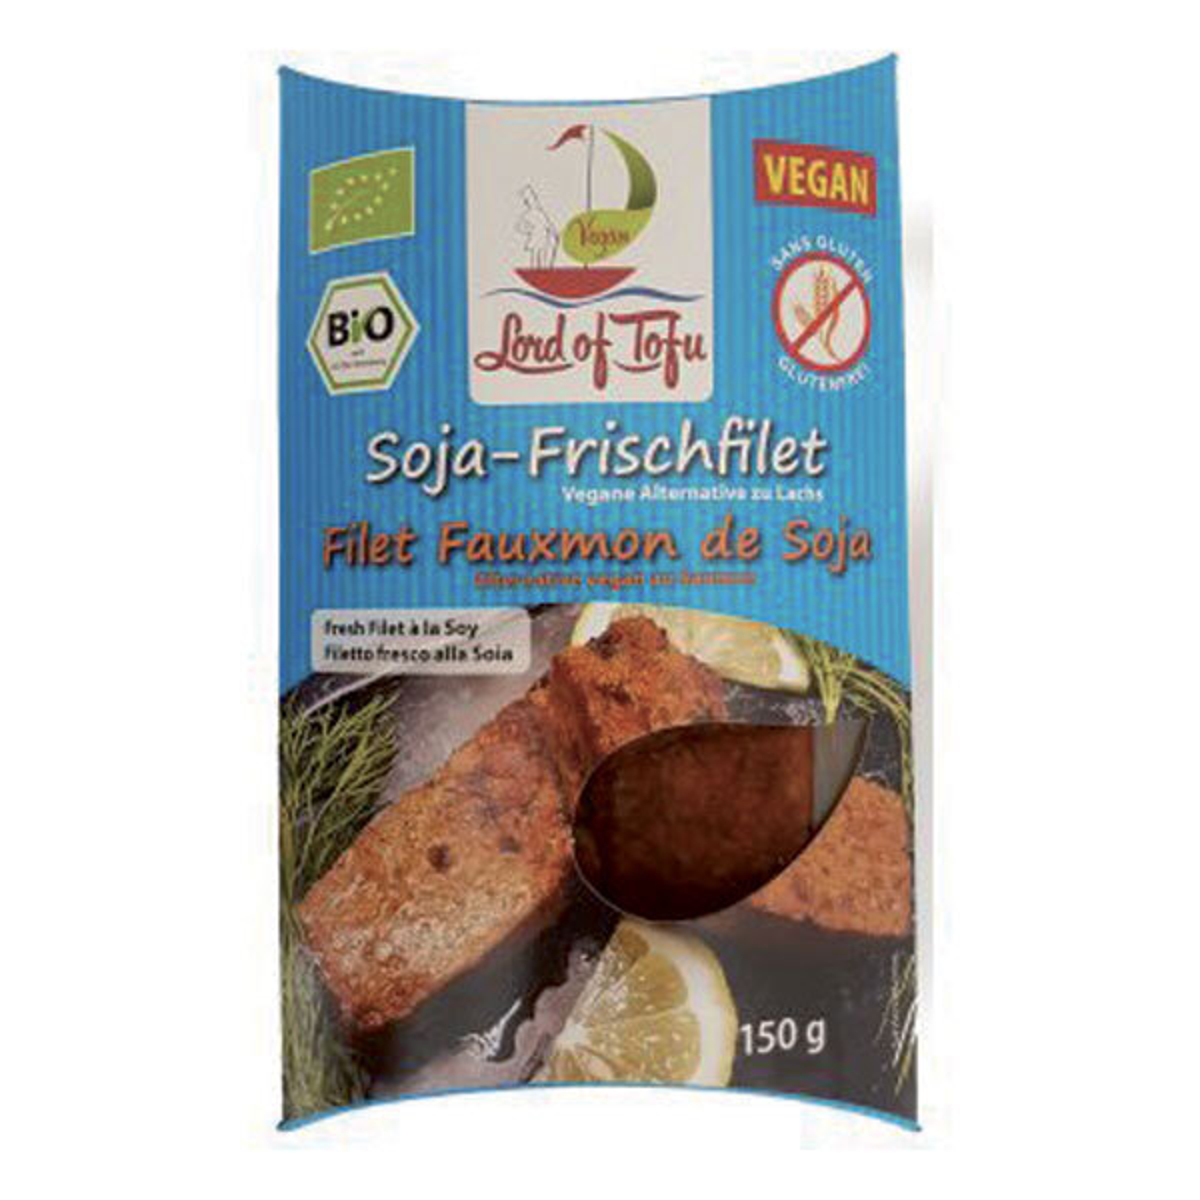 Lord of Tofu - Filet de fauxmon, alternative au saumon 150g